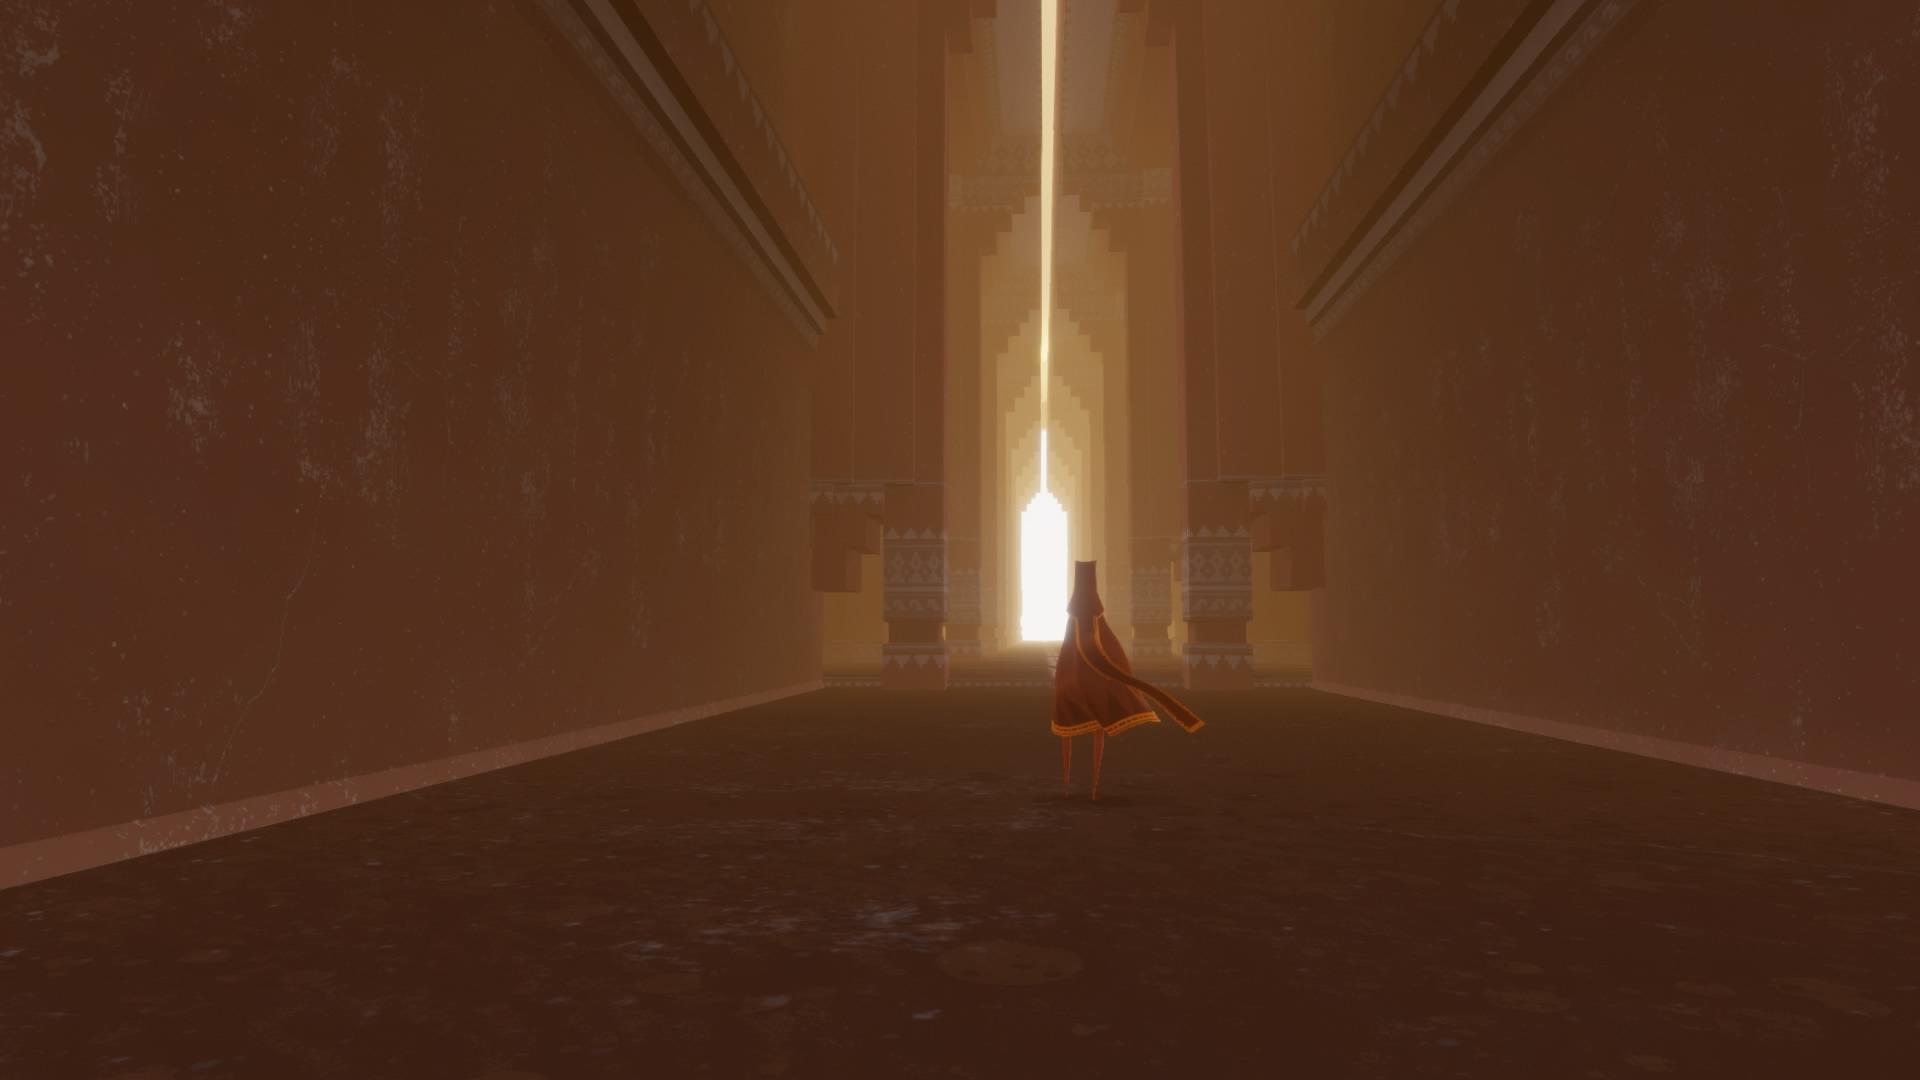 Image Courtesy of Sony Computer Entertainment America | thatgamecompany